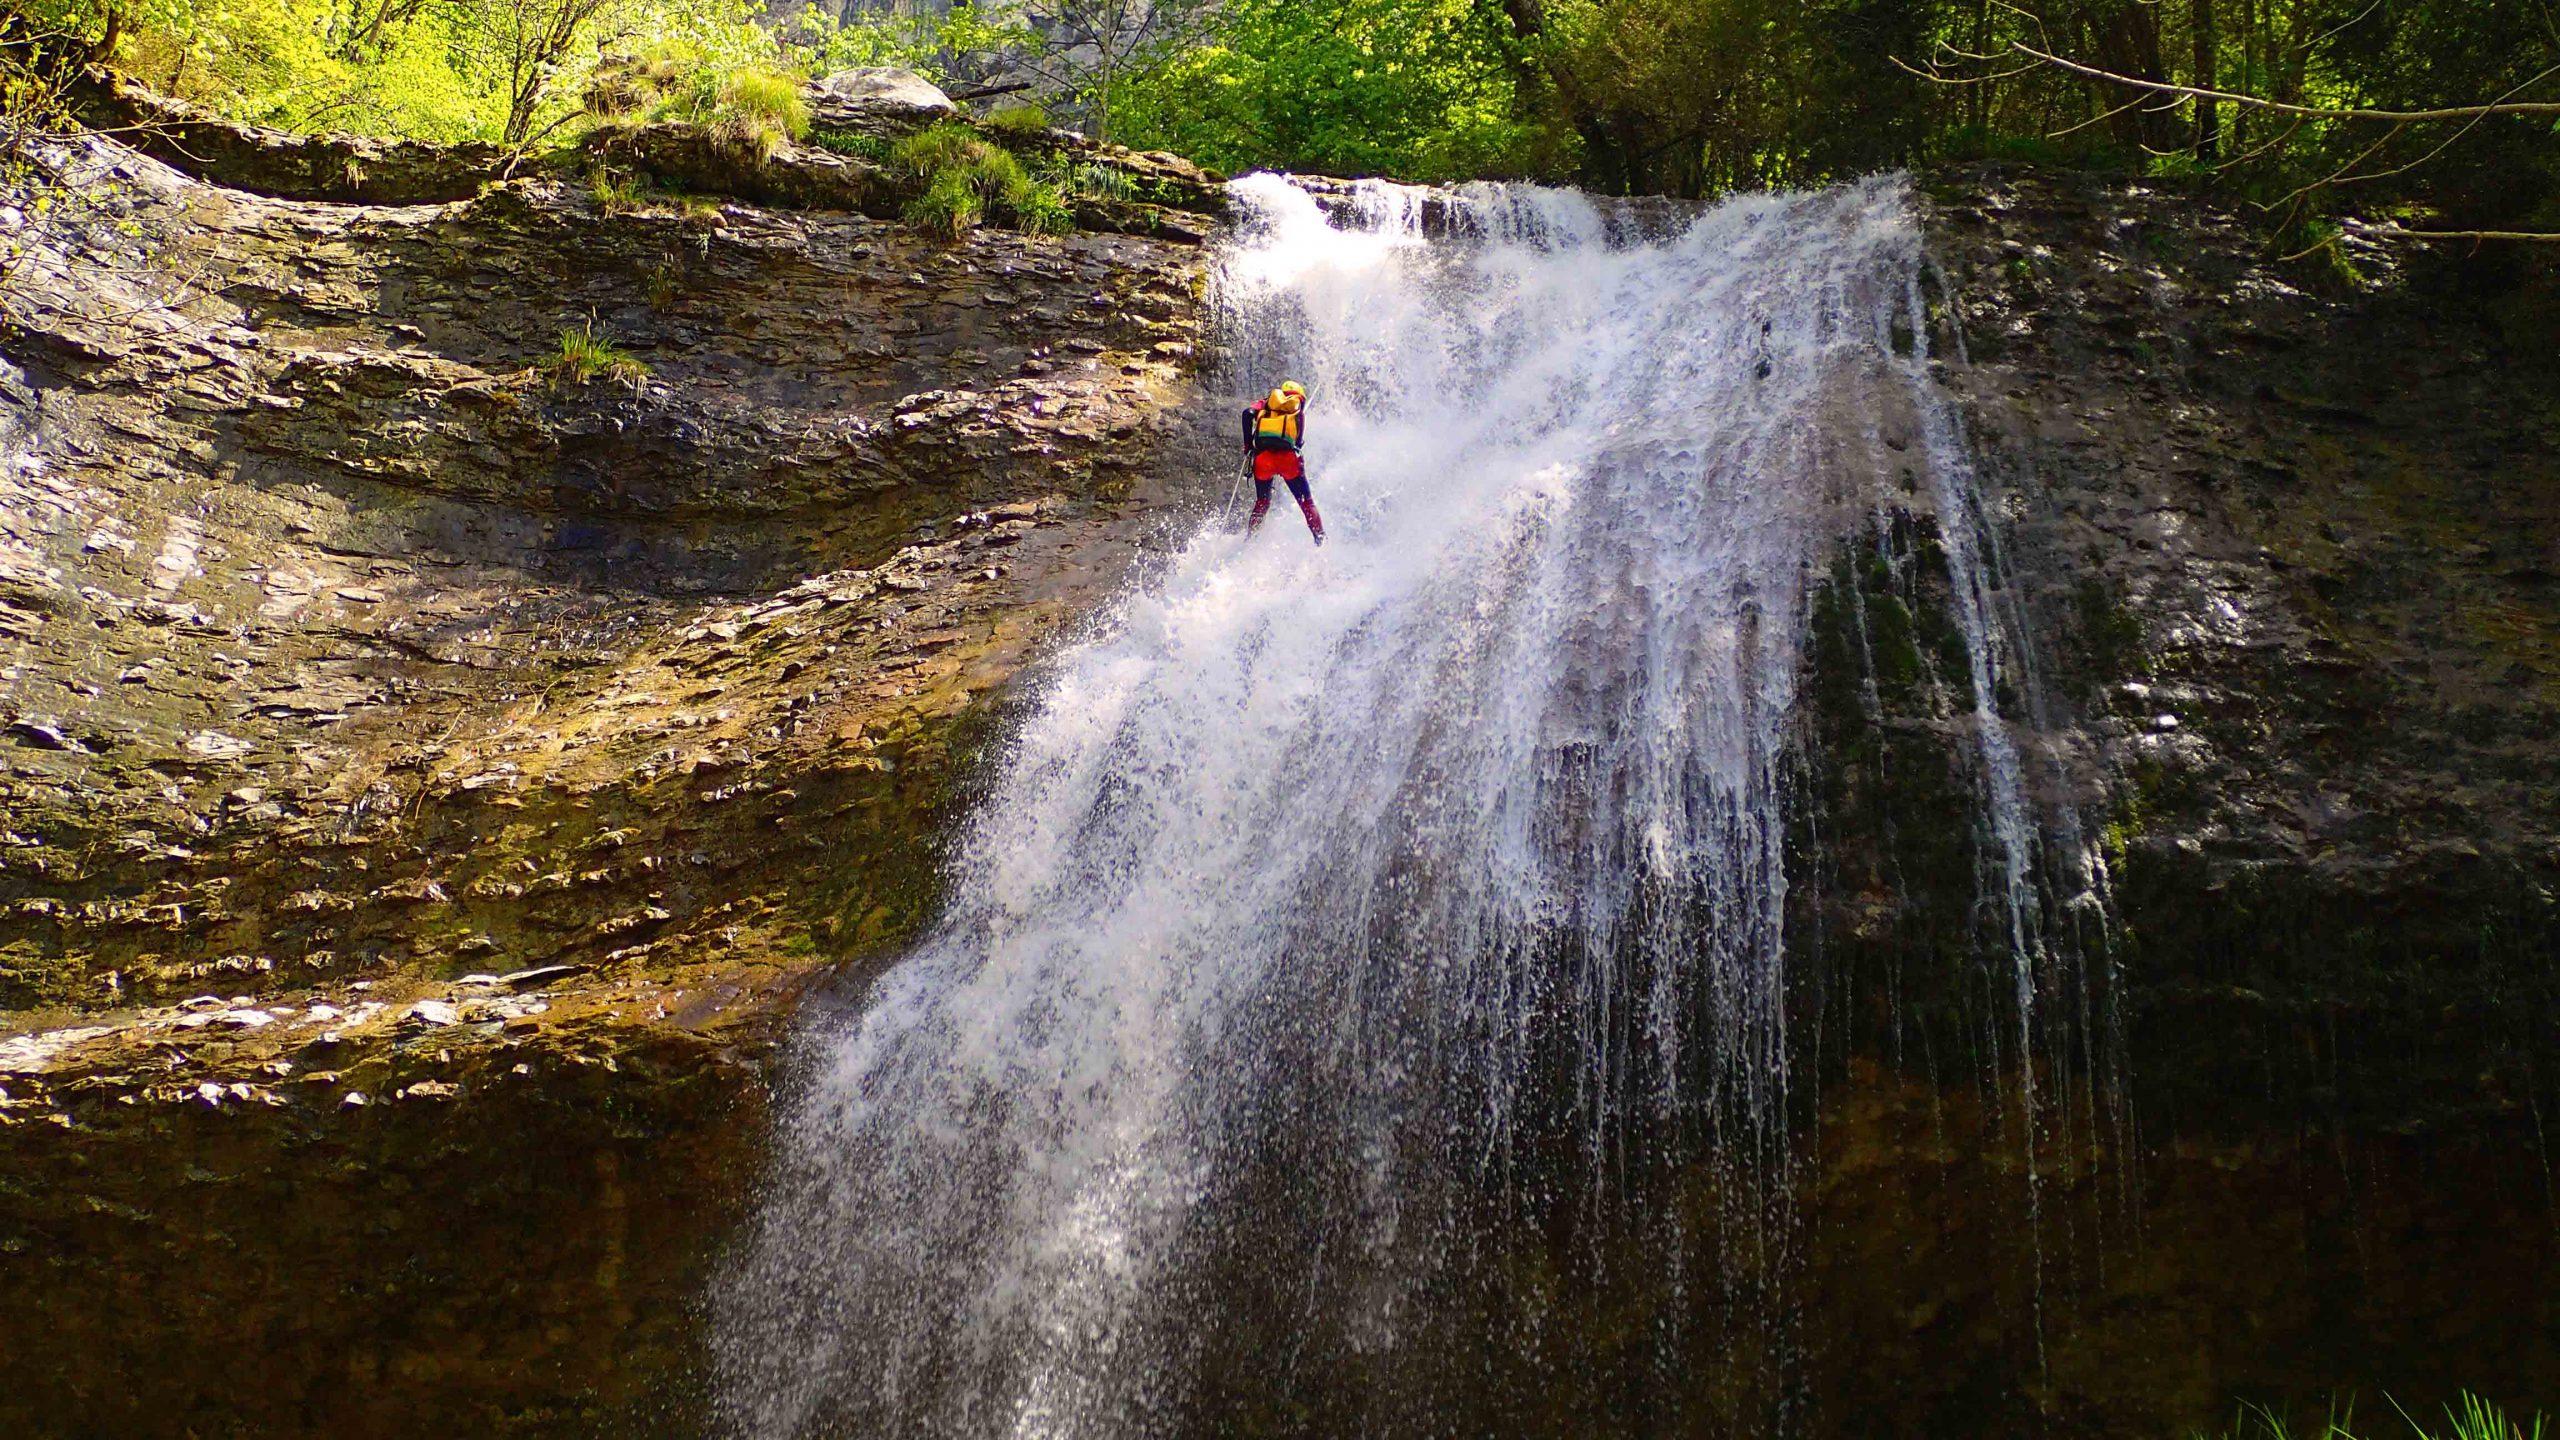 Canyoning-Evasion Canyon Ecouges partie basse Journée Massif du vercors